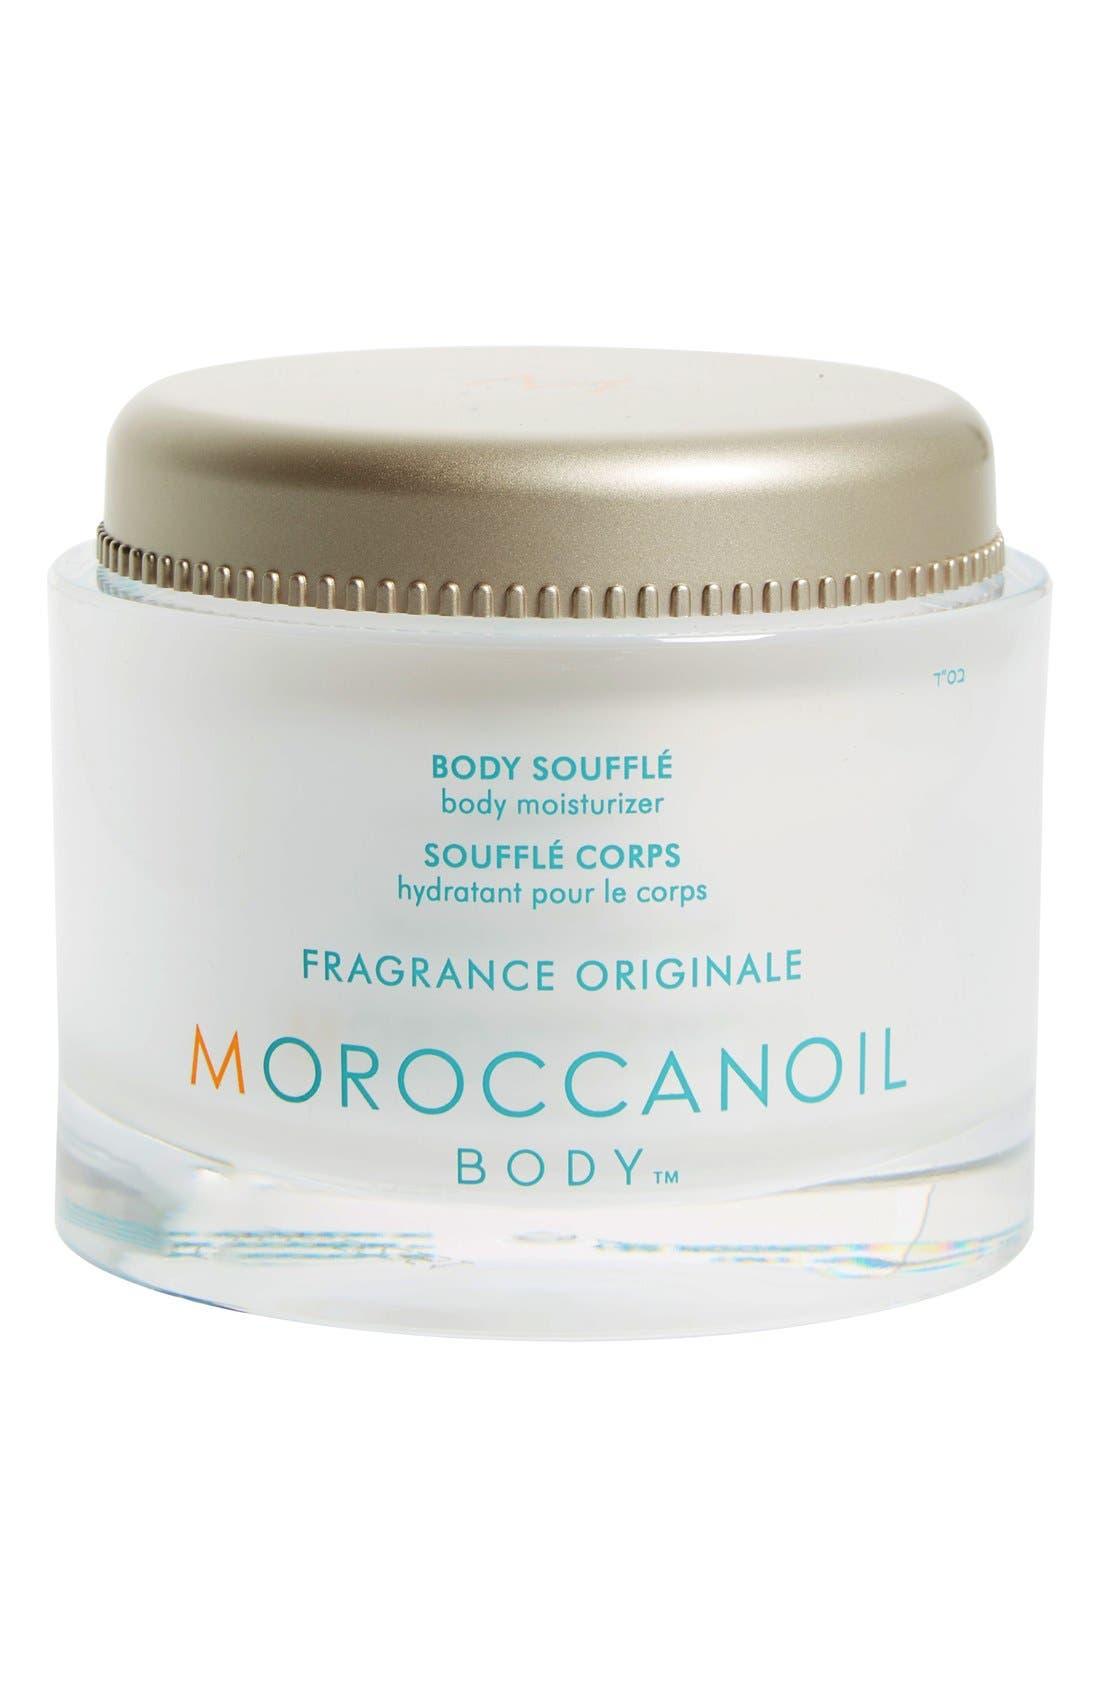 MOROCCANOIL® Body Soufflé